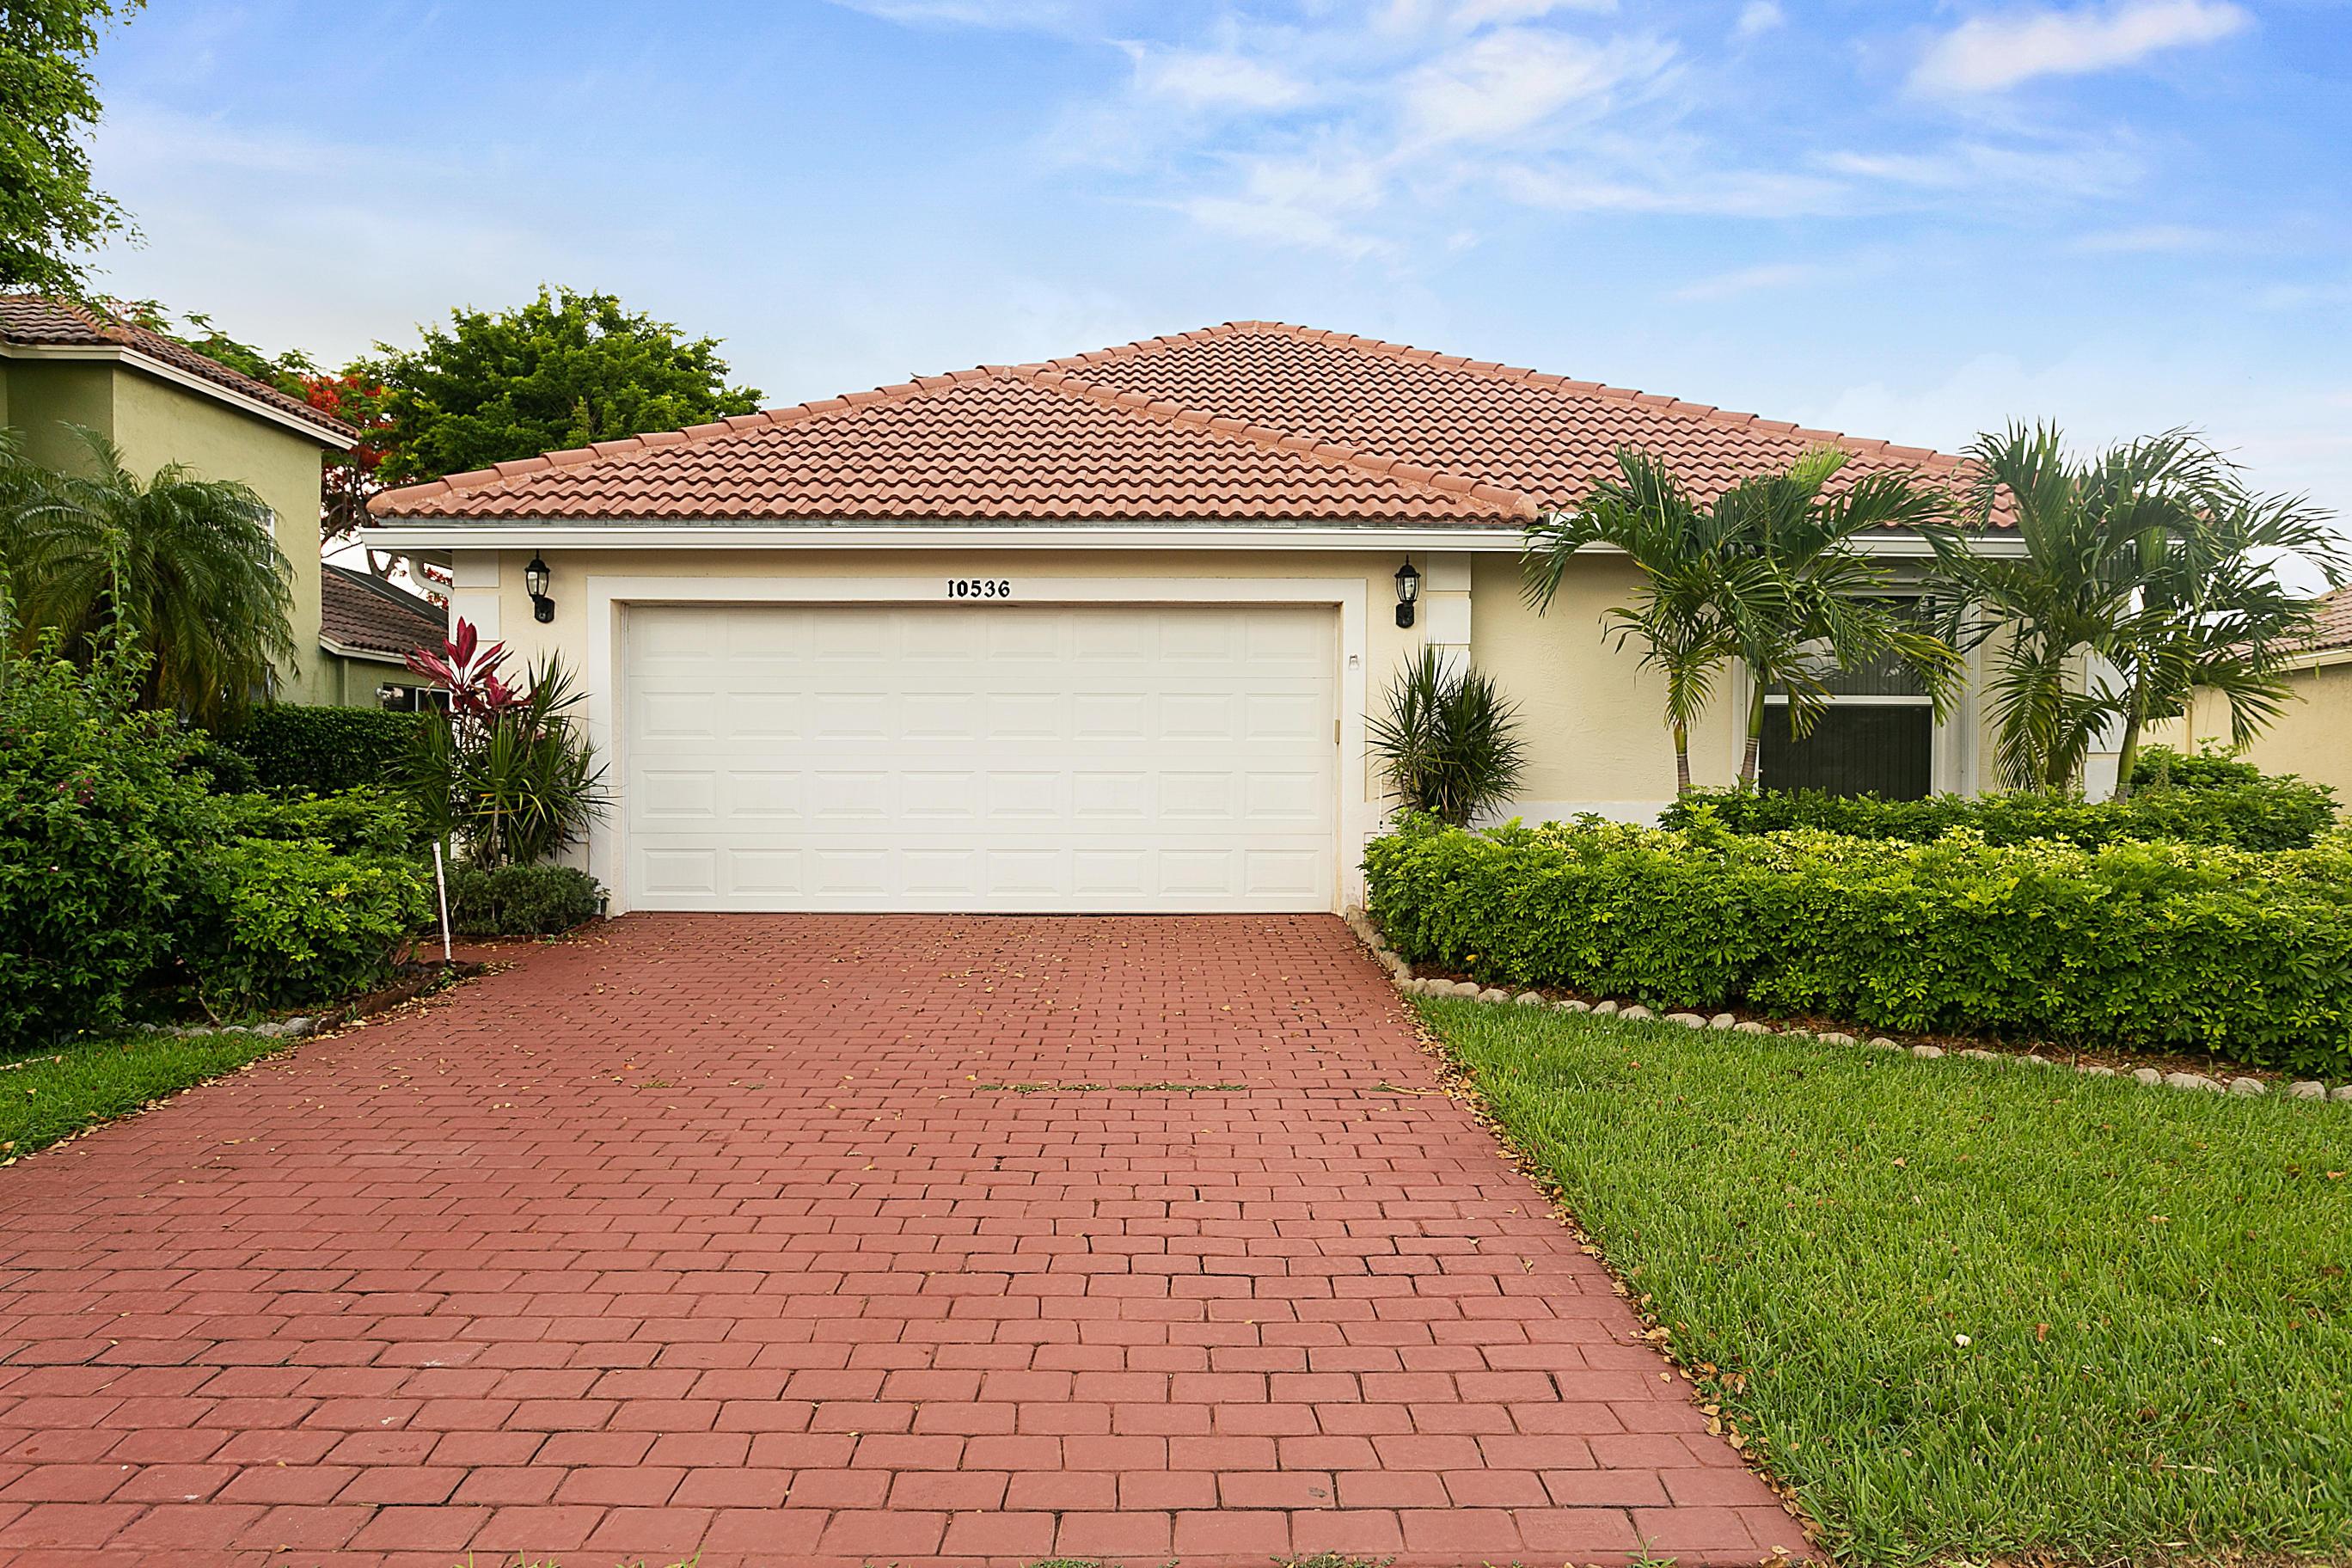 10536 Plainview Circle Boca Raton, FL 33498